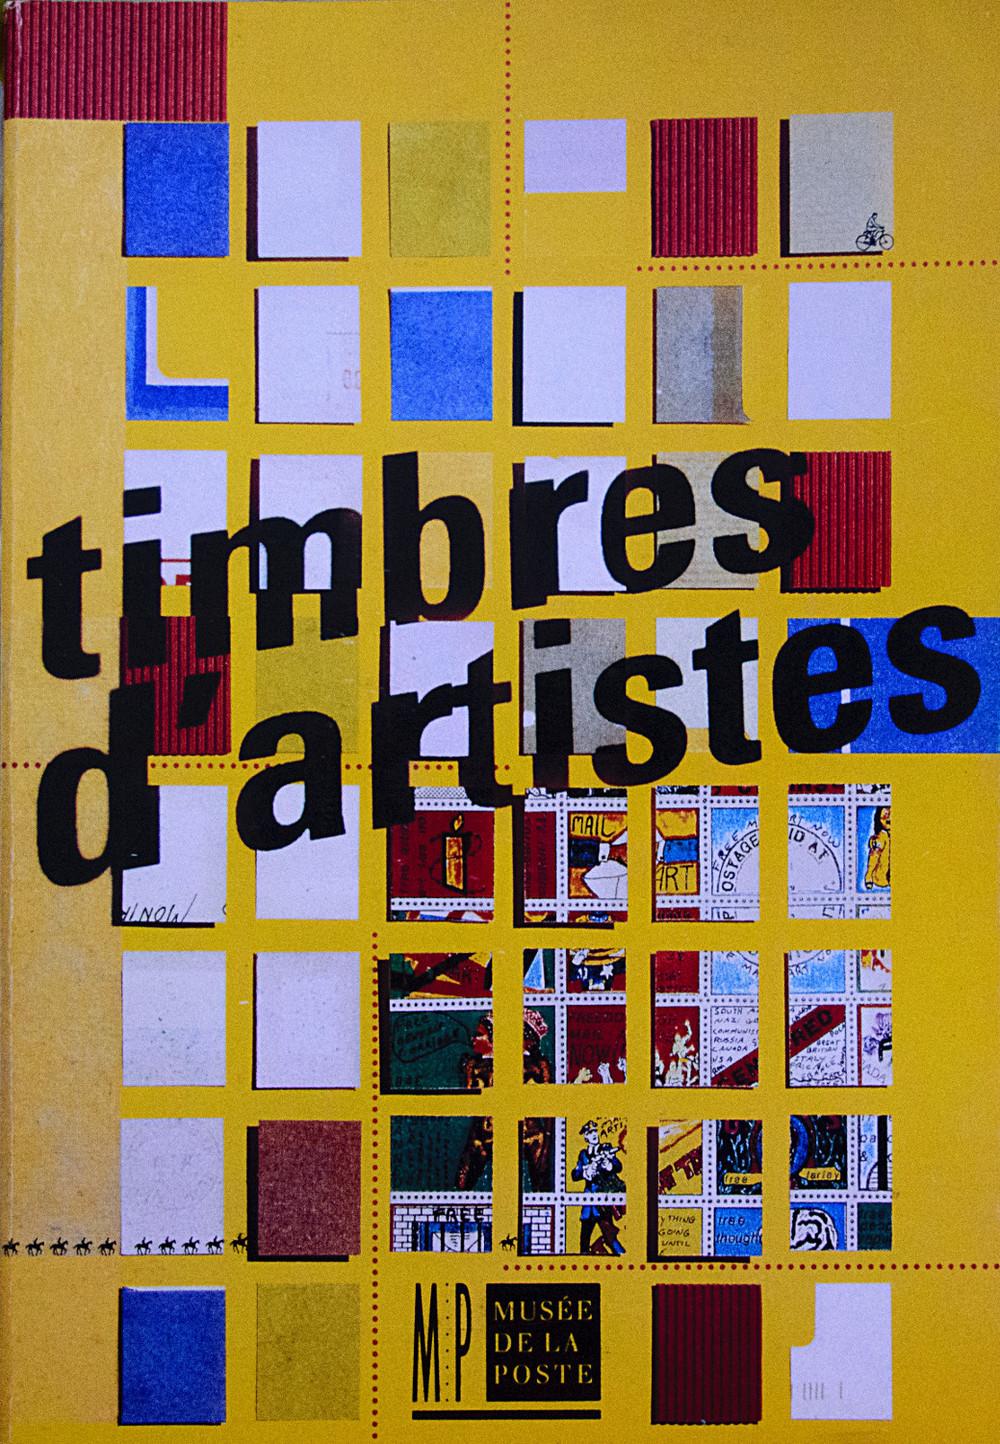 Timbres d'Artistes:Ed. Jean-Noël Laszlo